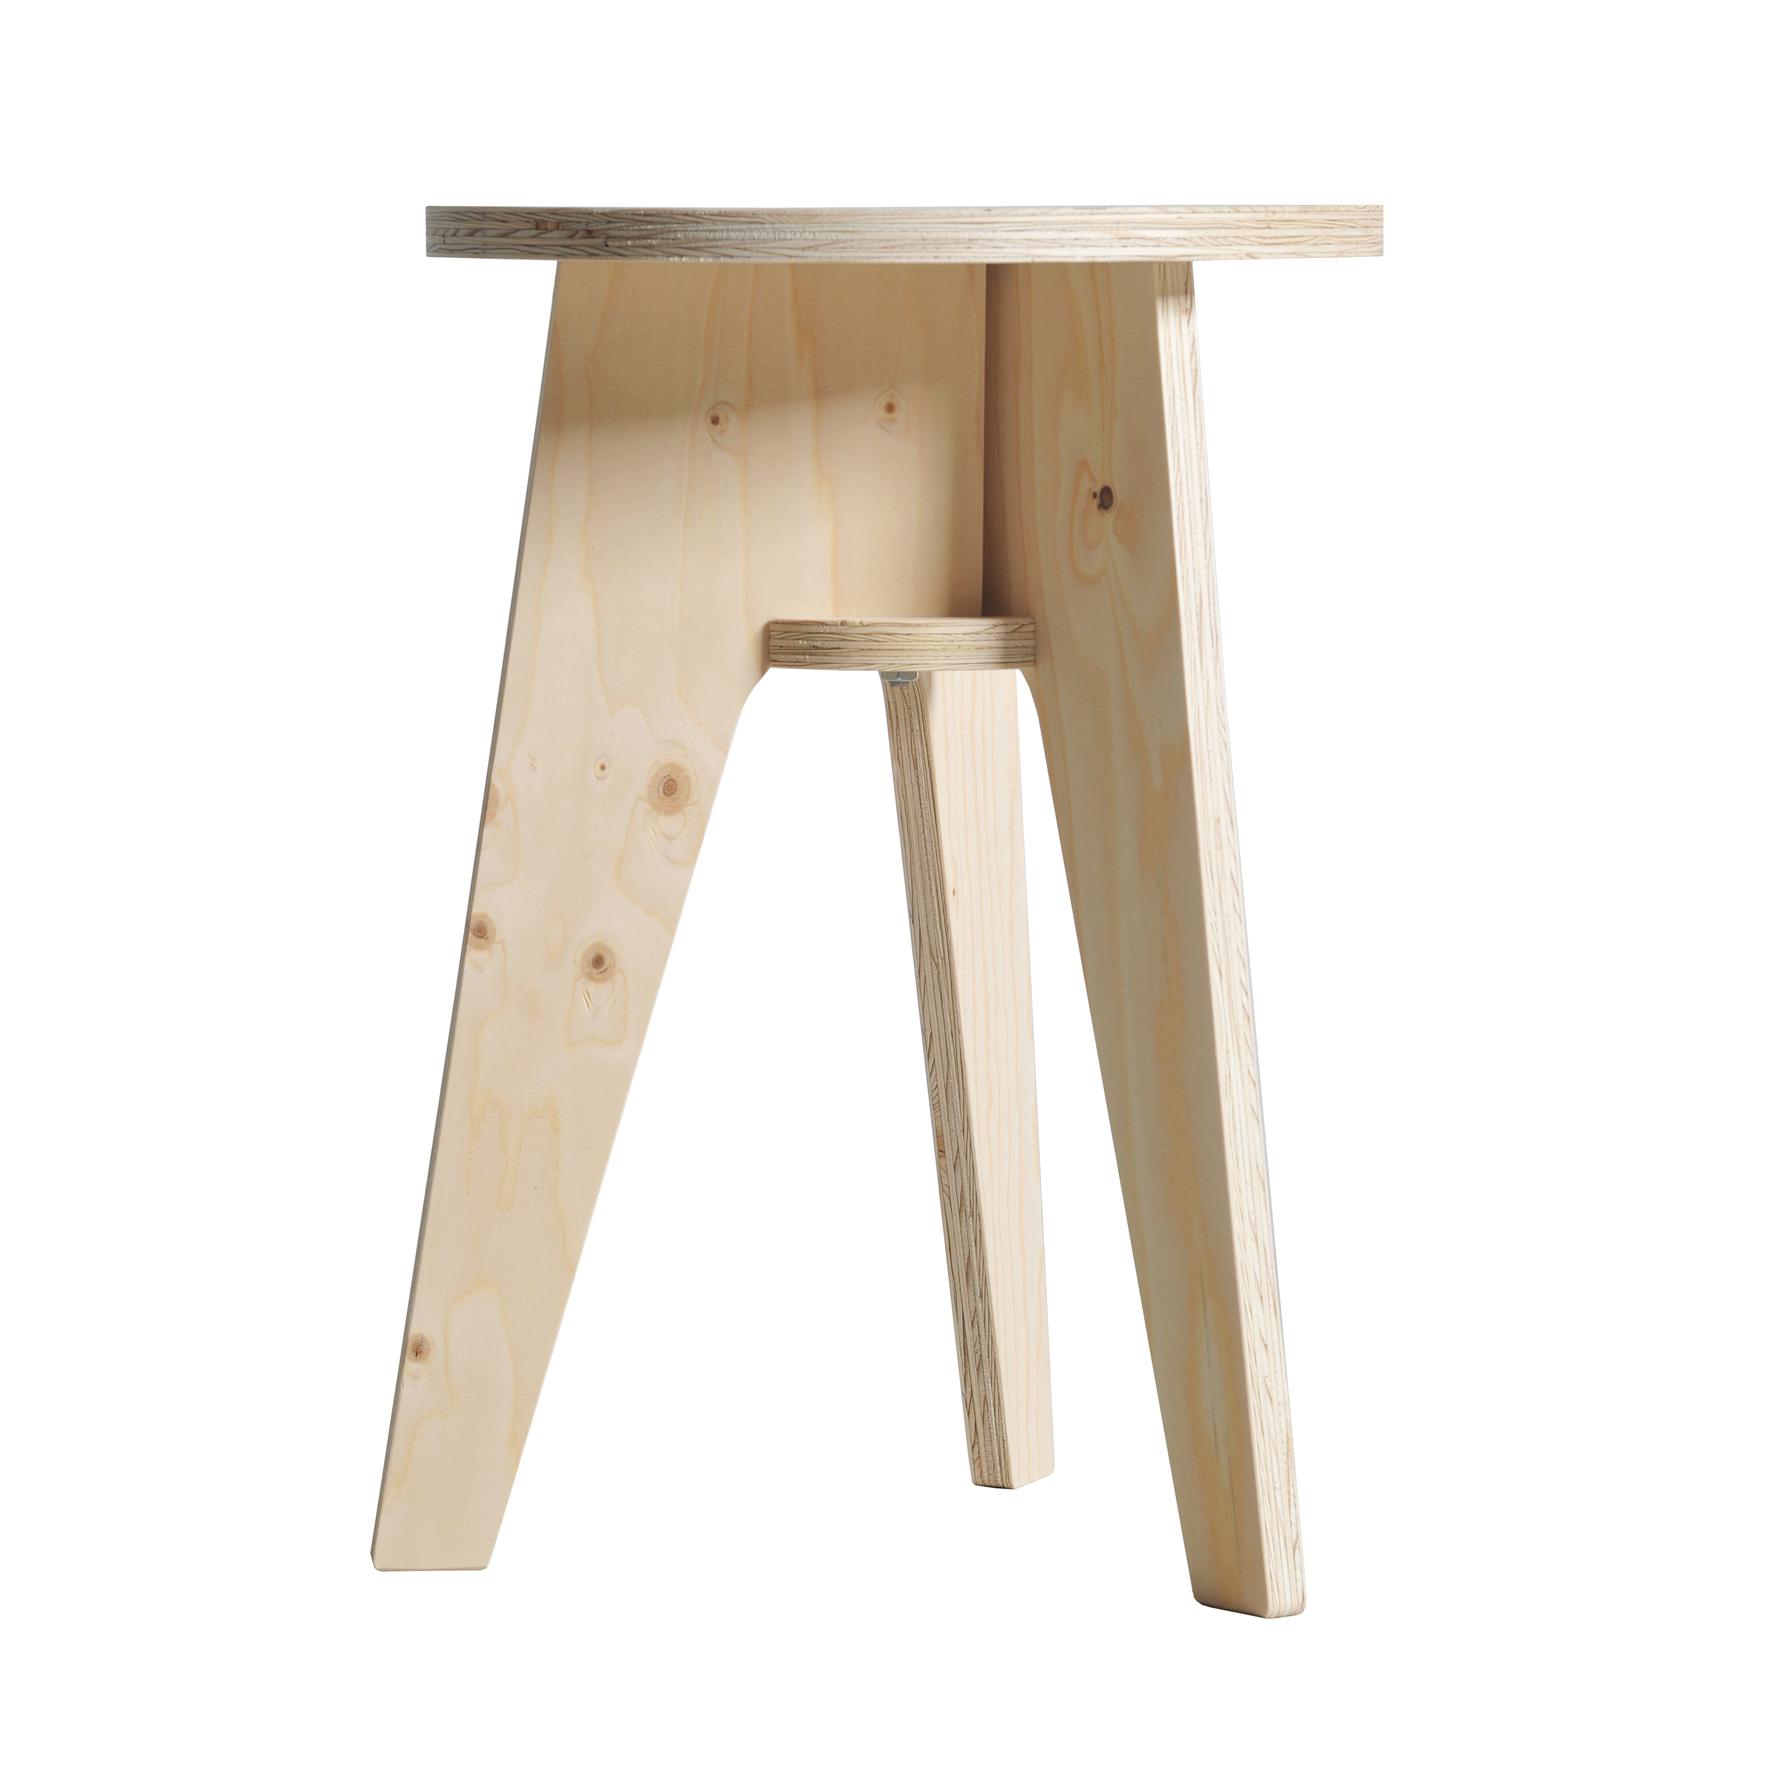 Spiksplinternieuw Crisis 2014 stool • PIET HEIN EEK AZ-23